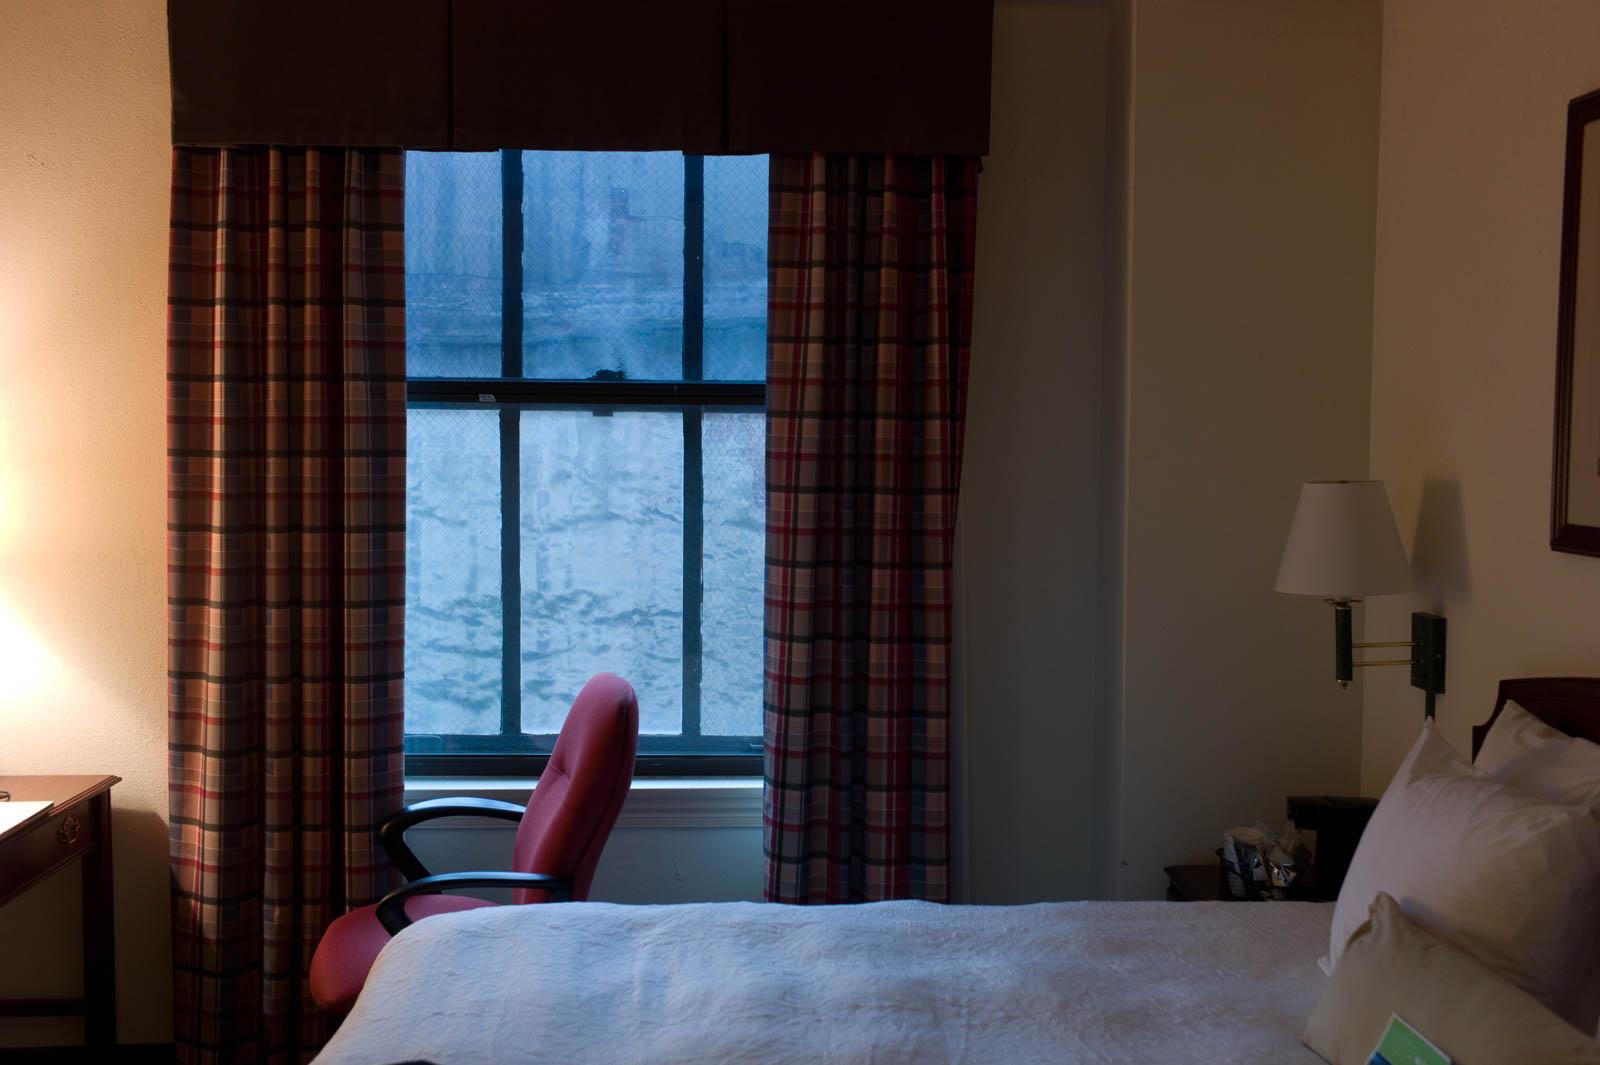 Room 416, Hampton Inn, Indianapolis